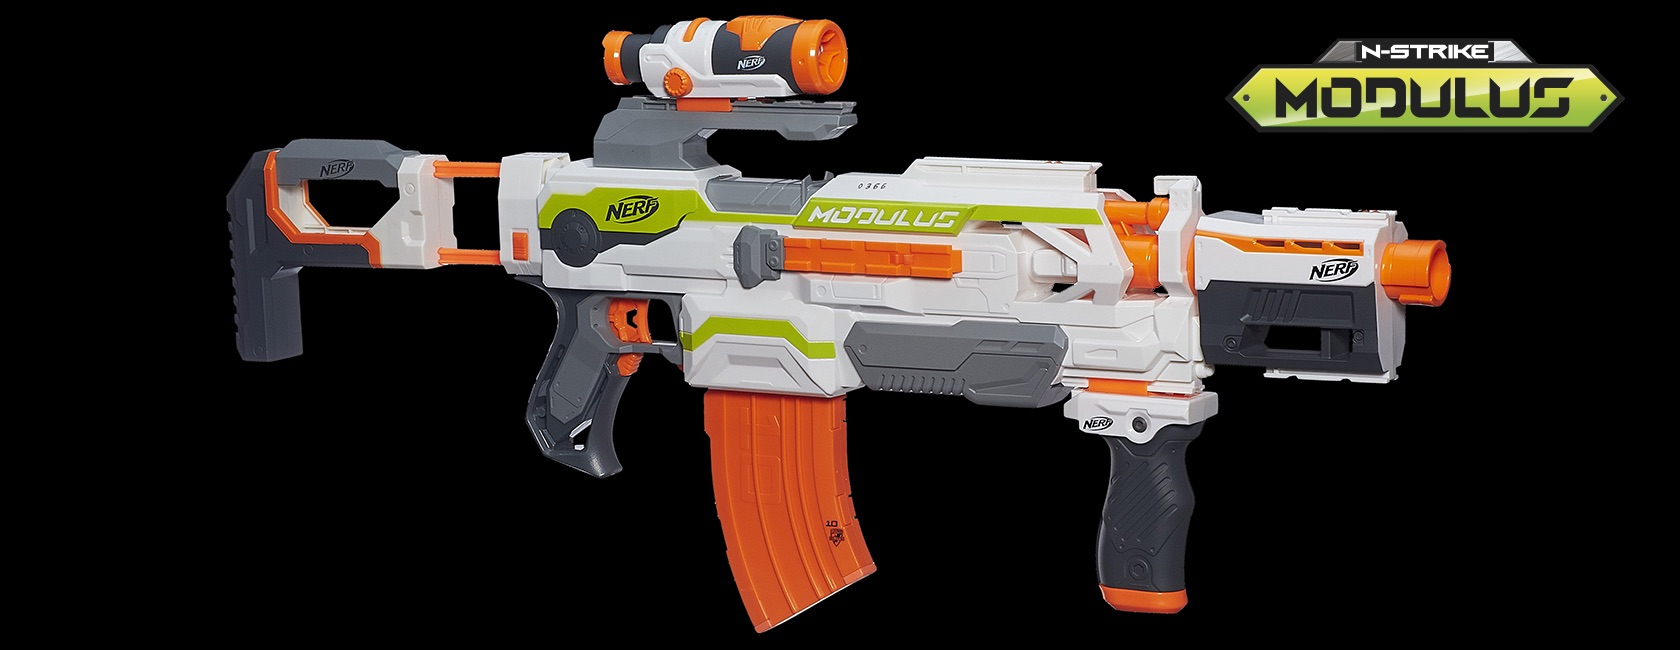 Modulus ECS-10